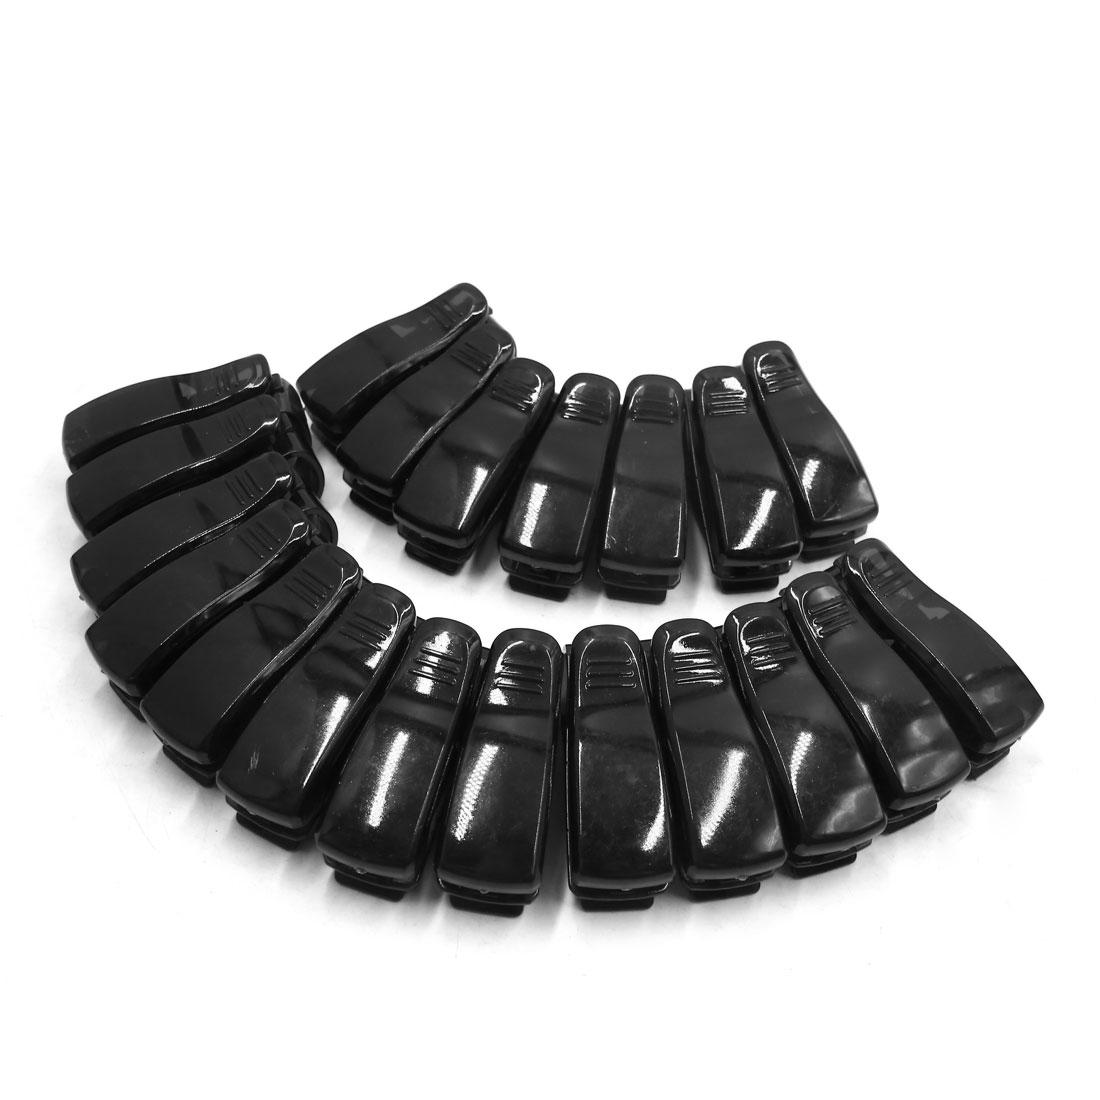 20Pcs Black Plastic Car Auto Sun Visor Sunglasses Eyeglasses Card Holder Clip